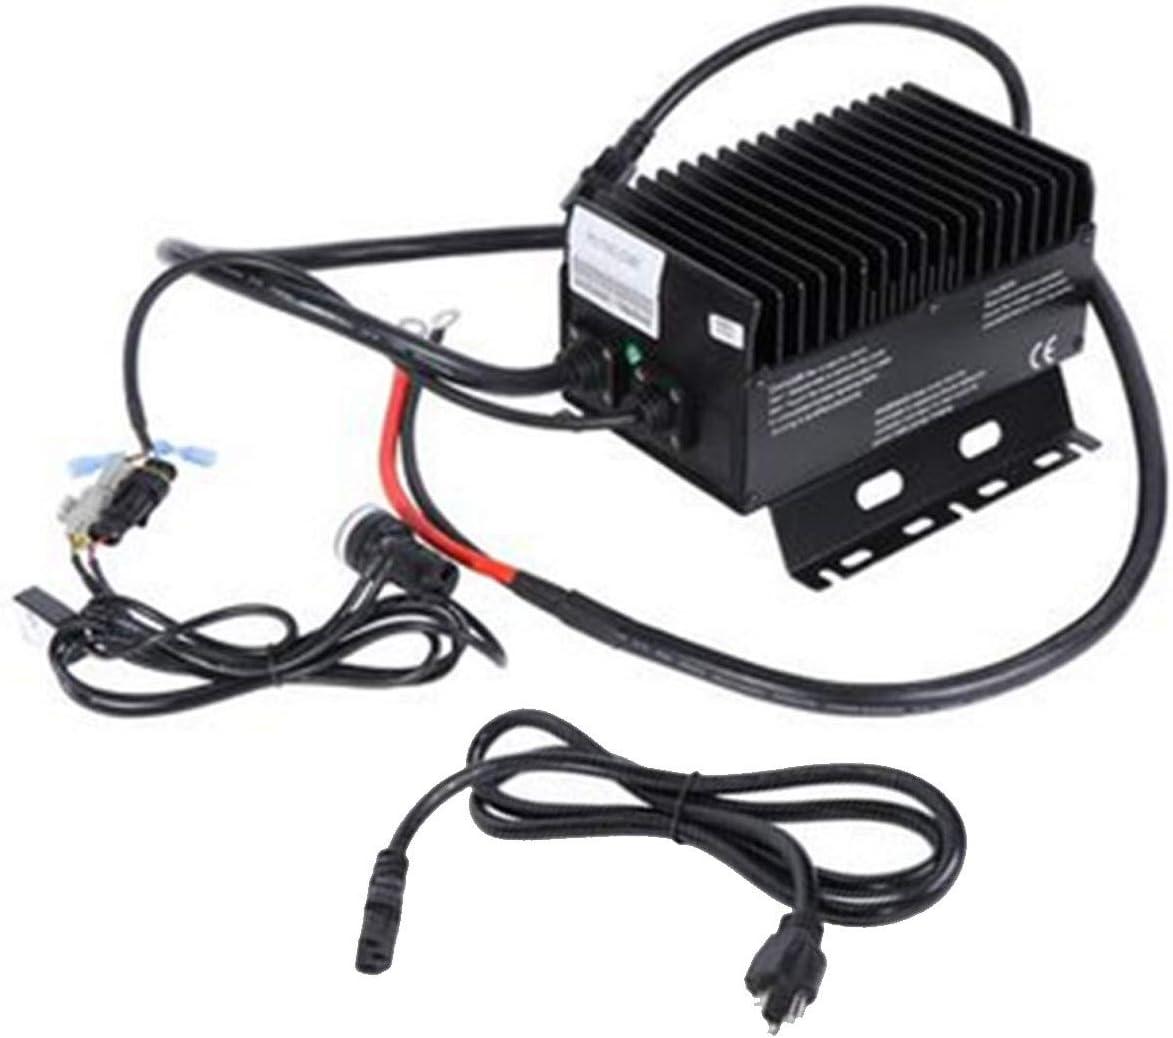 b01-05-0056 b01050056 cargador de batería 25A 24V para elevador de tijera haulotte